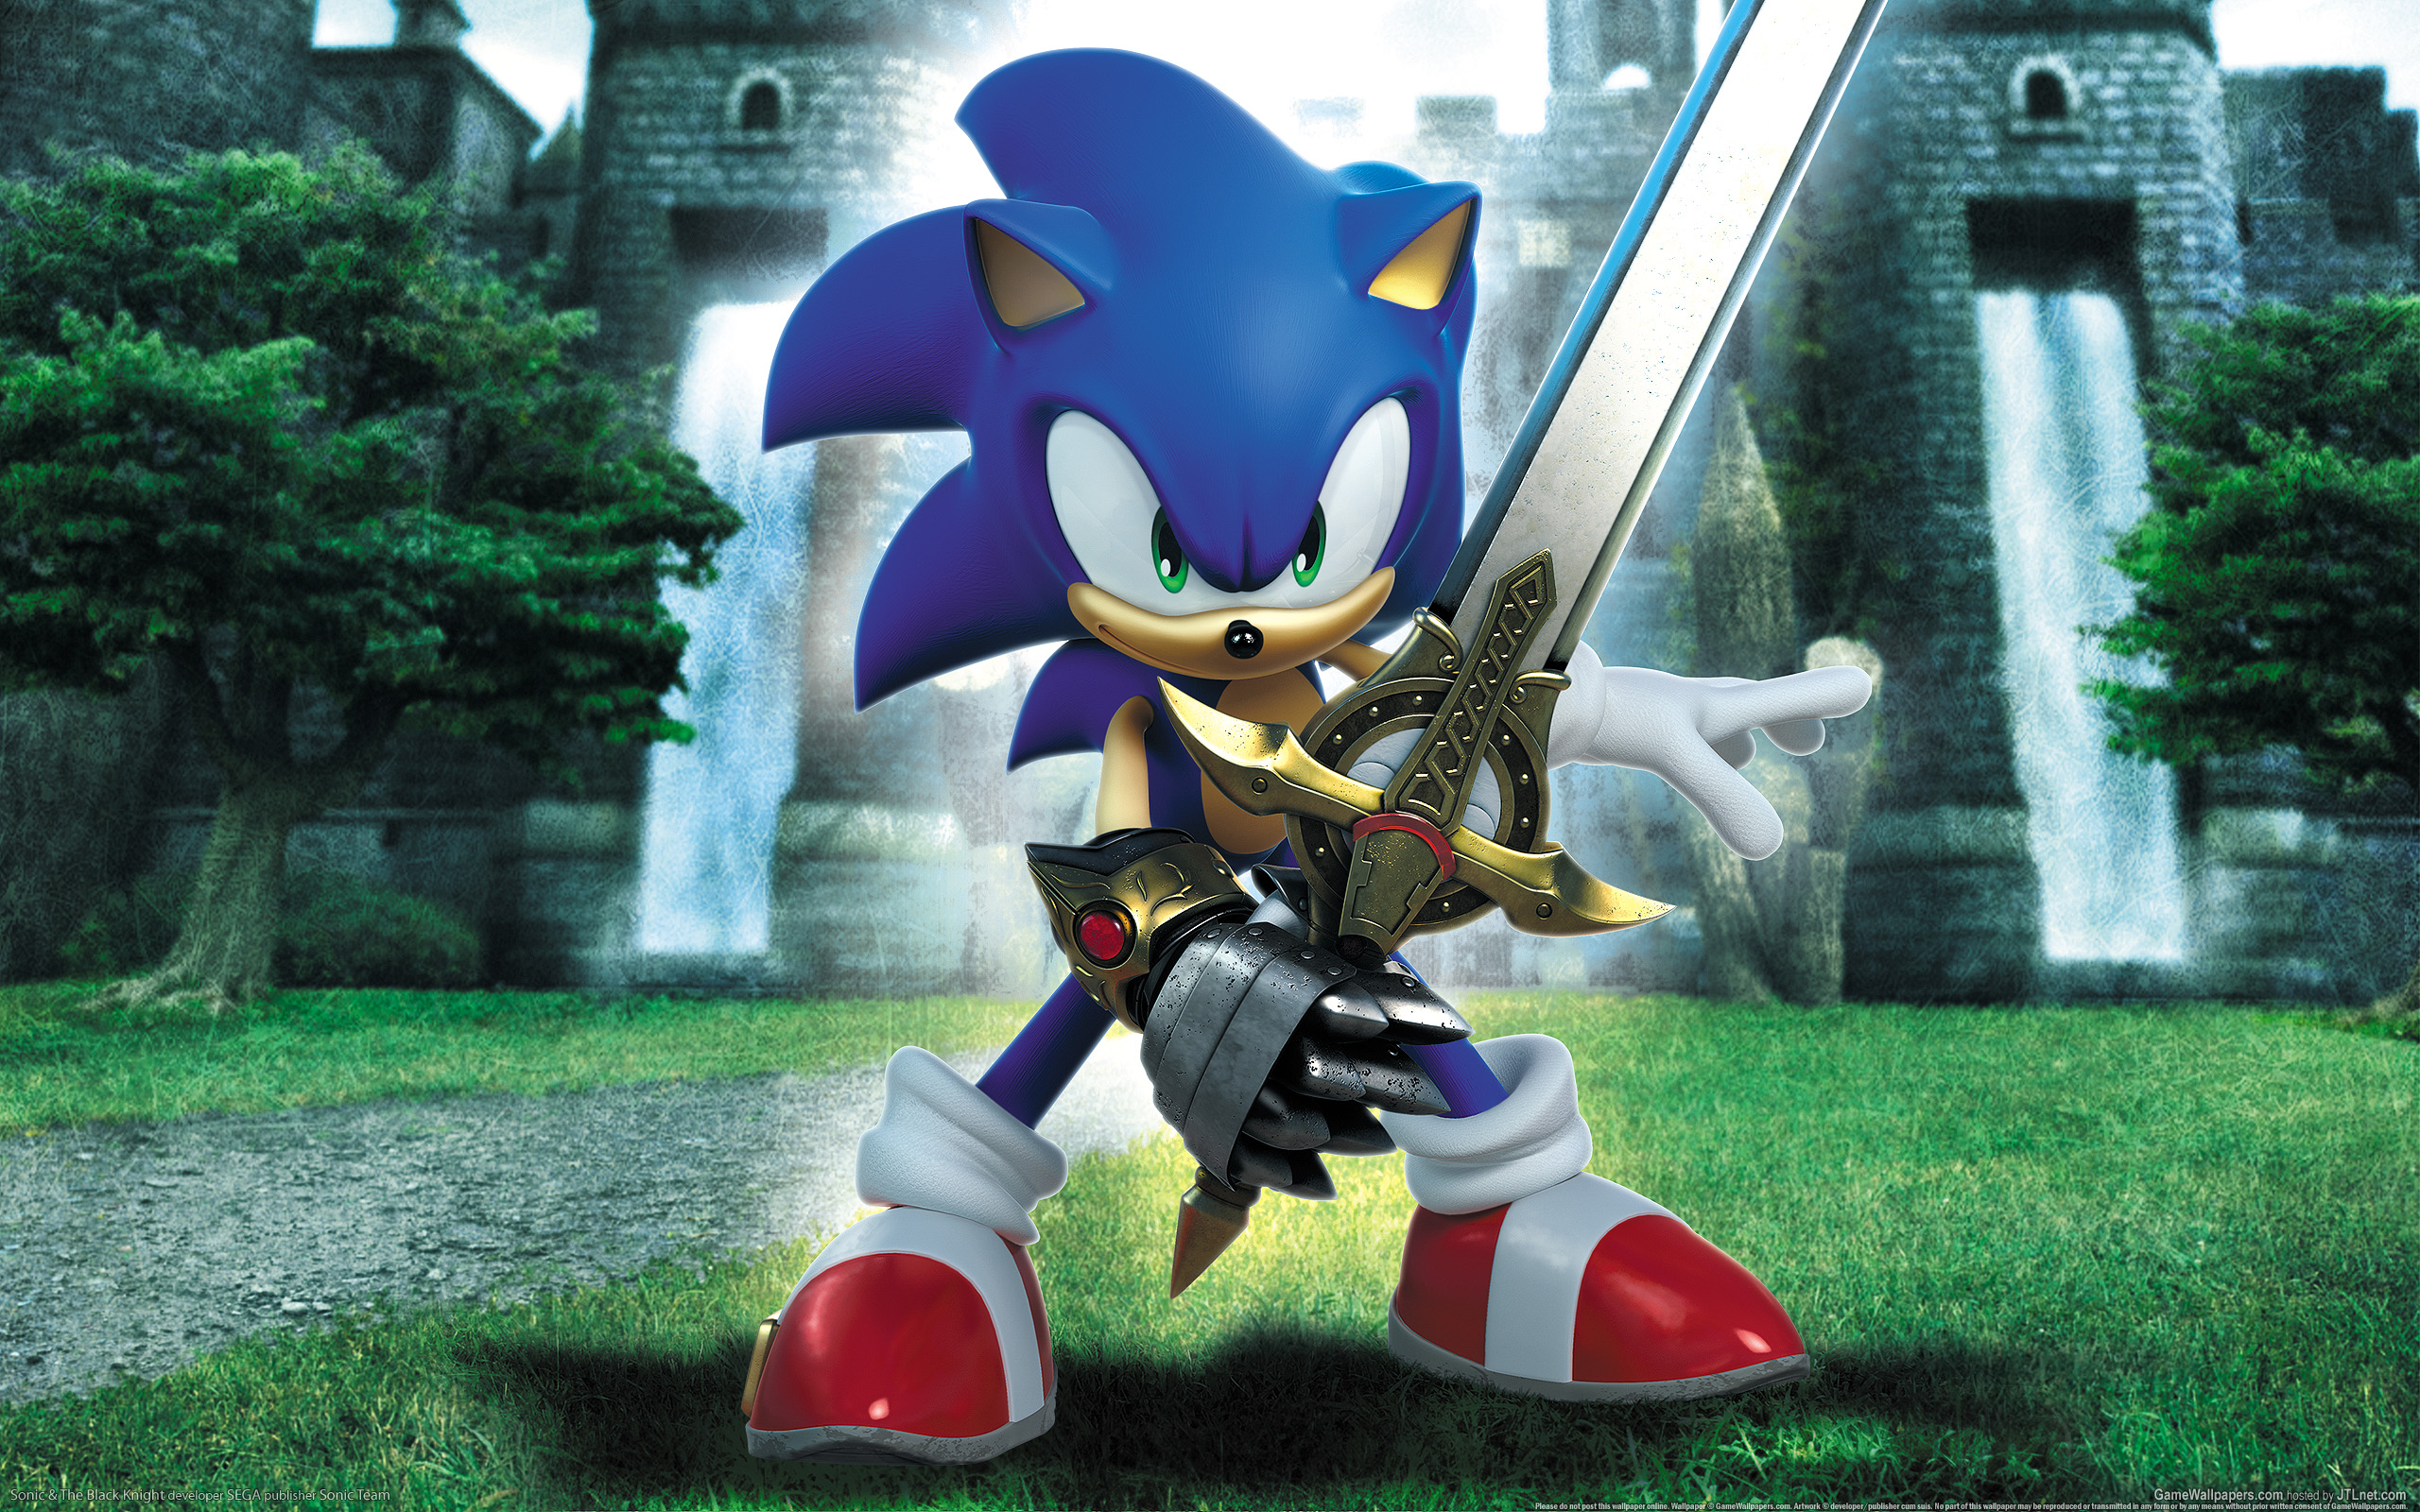 Sonic The Hedgehog Character Hd Wallpaper 461999 Zerochan Anime Image Board